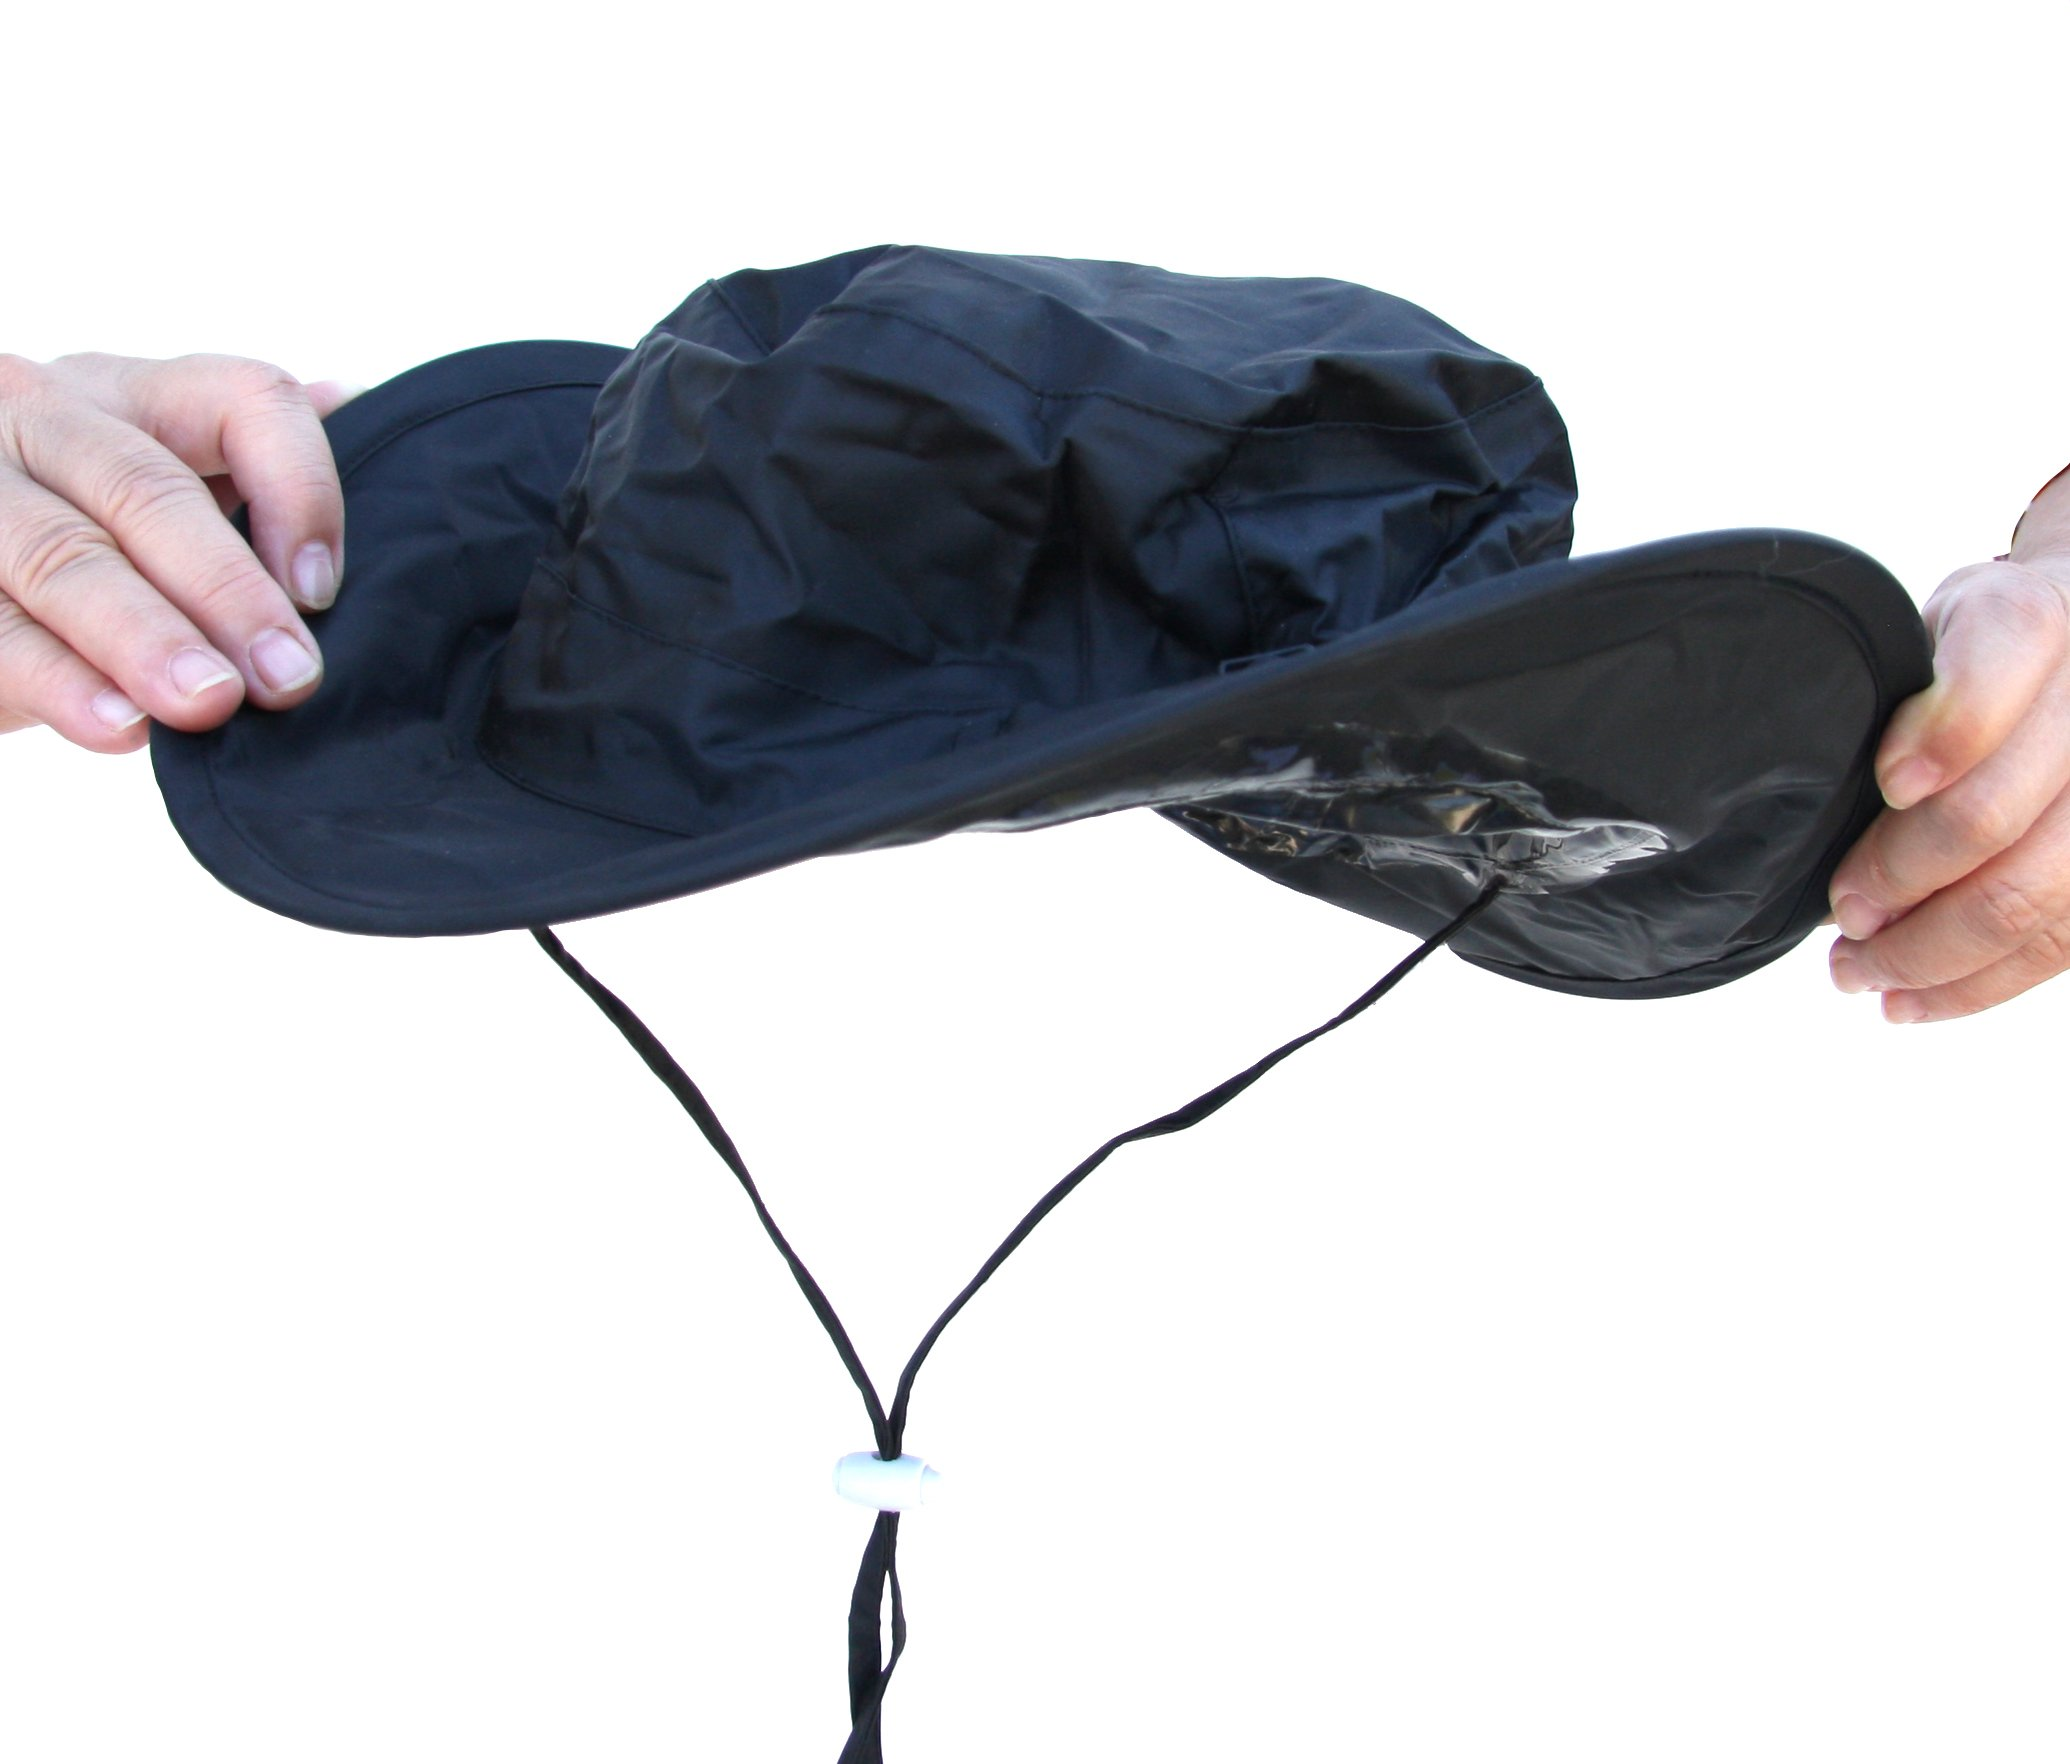 Twist-and-Fold Rain Hat, Unisex, 13 in diameter brim, Black